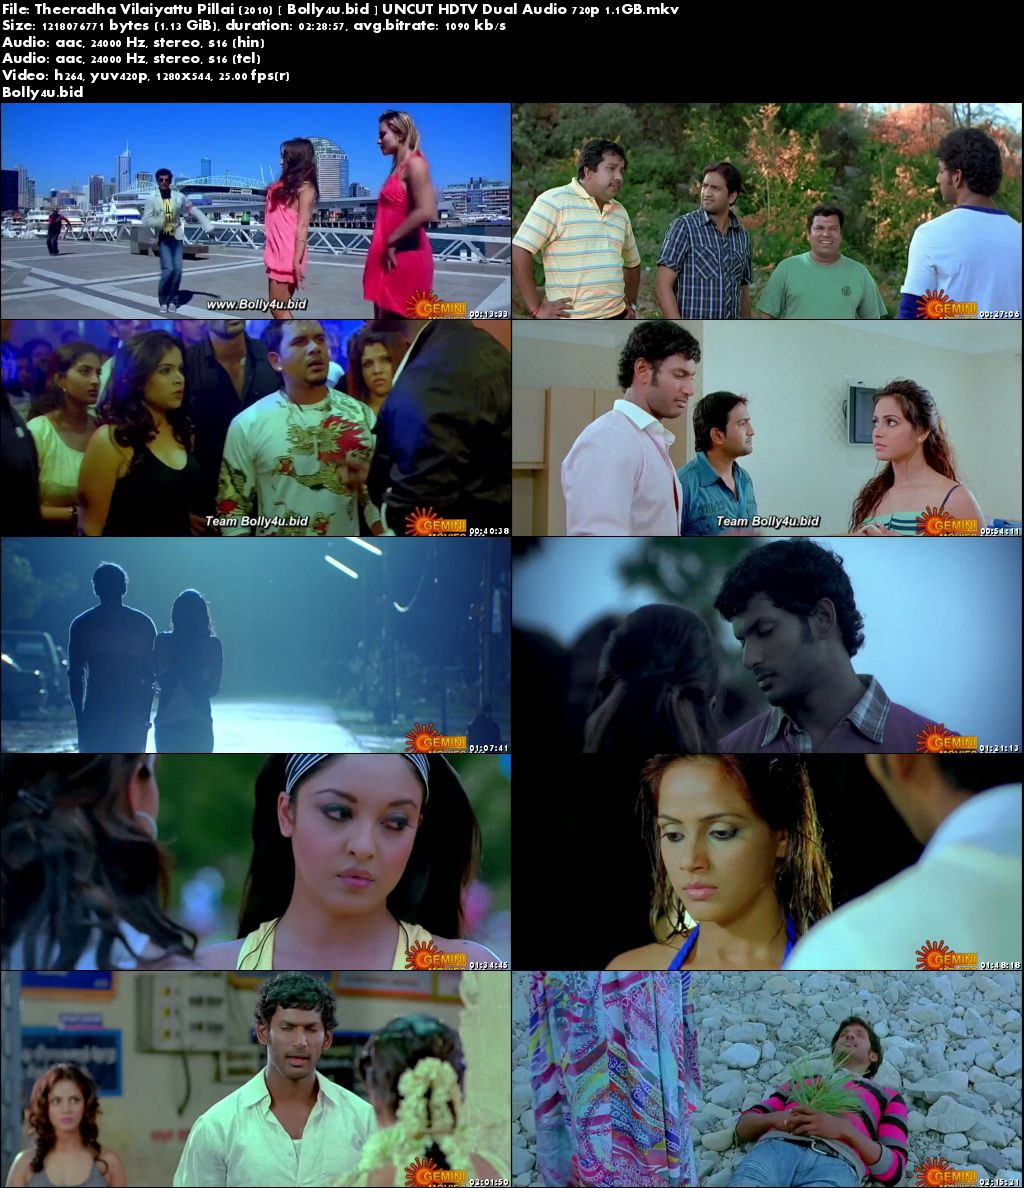 Theeradha Vilaiyattu Pillai 2010 HDTV UNCUT Hindi Dual Audio 720p Download